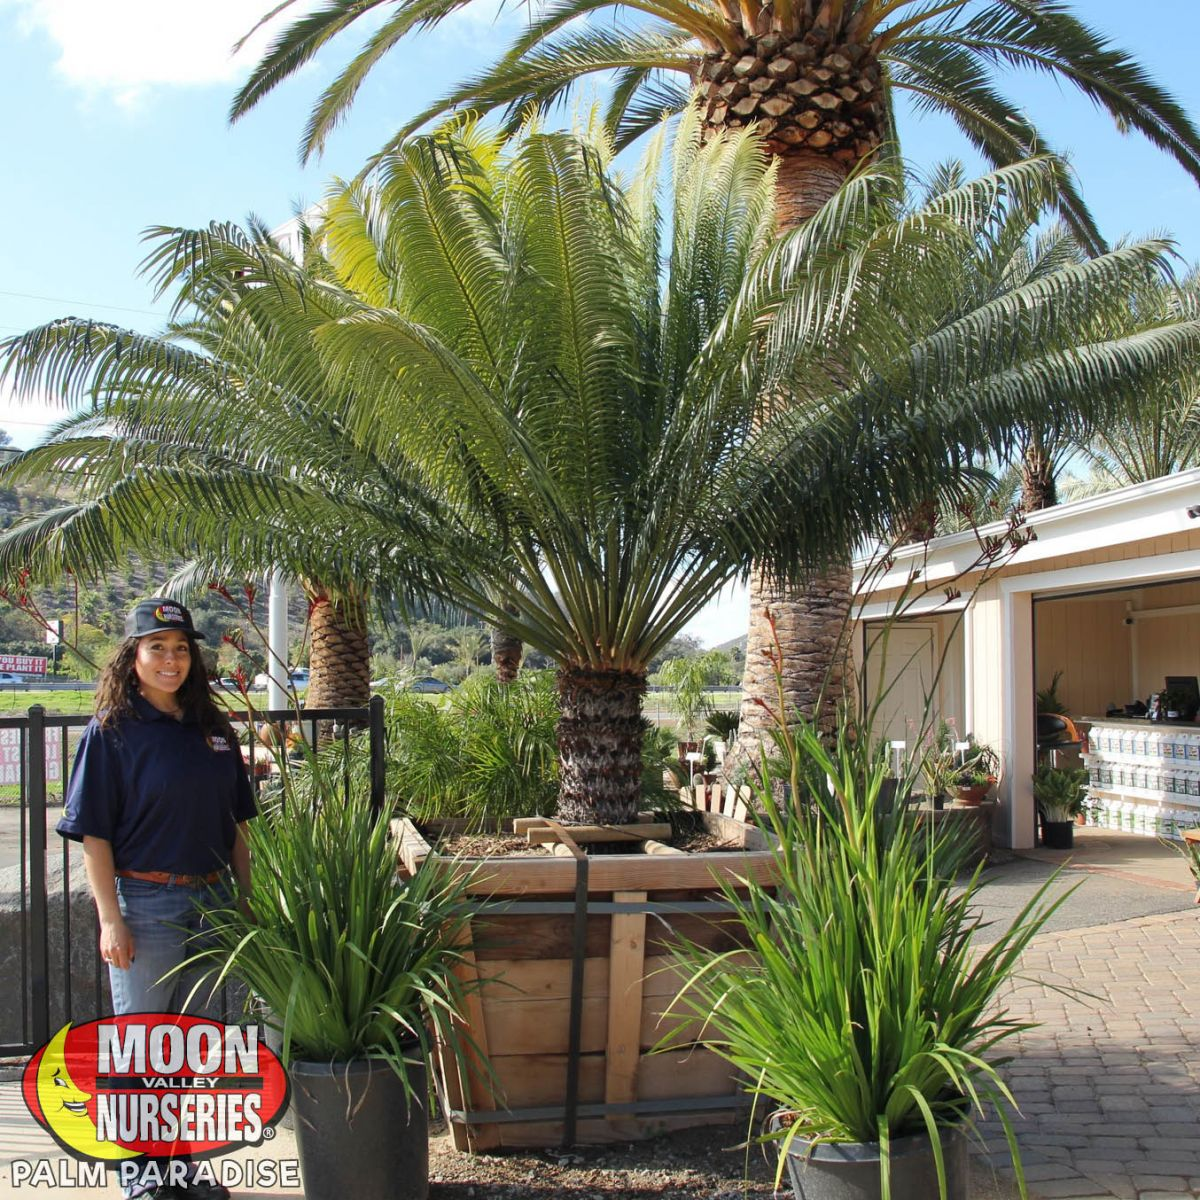 Queen Sago Palm Palm Tree Palm Paradise Nursery